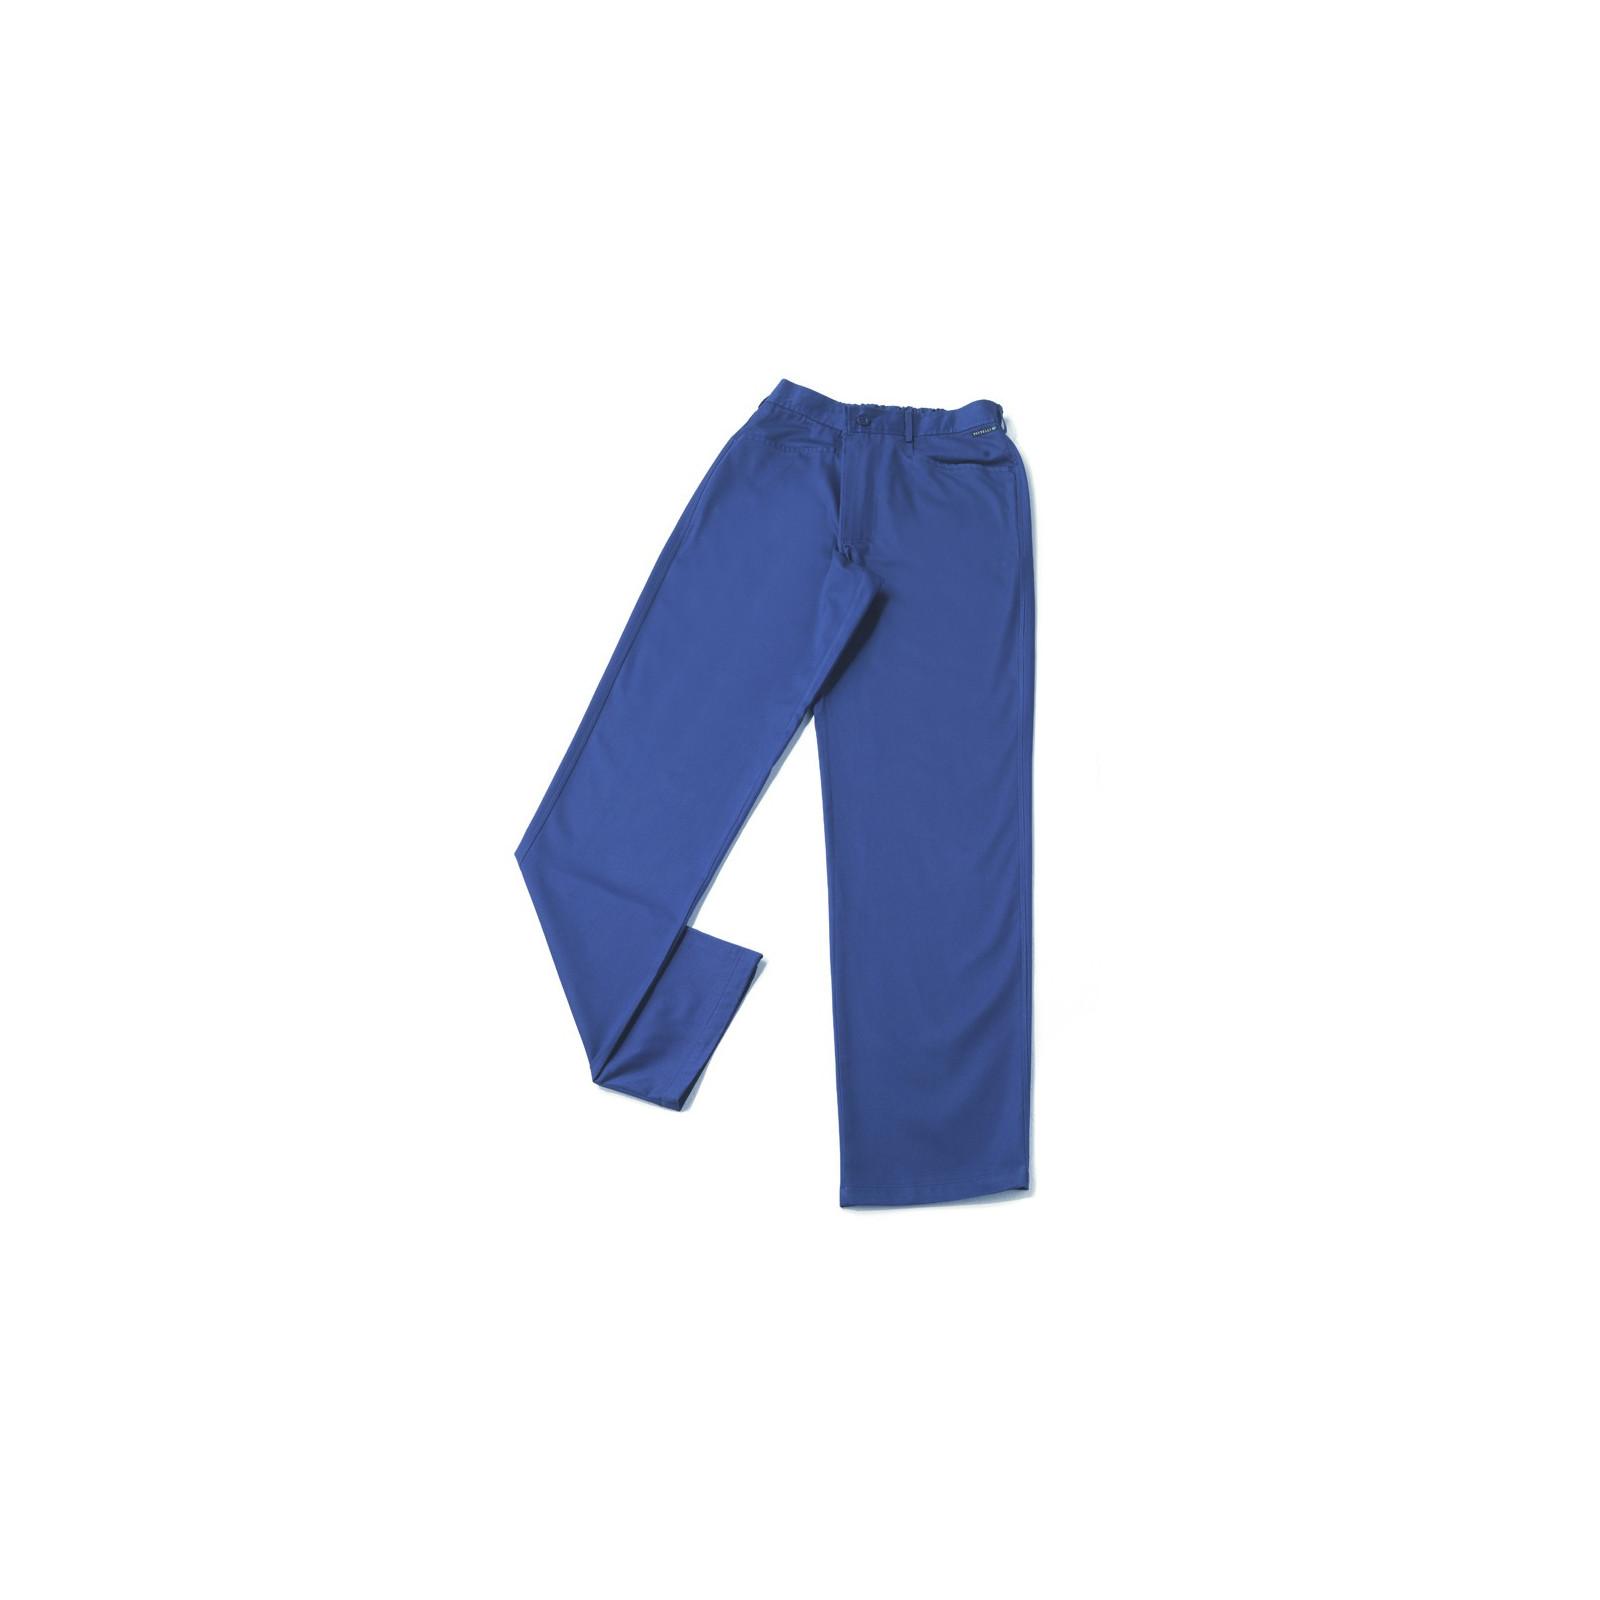 "Pantalon homme PASTELLI coupe classique ""Nevada"", Pastelli (Nevada)"